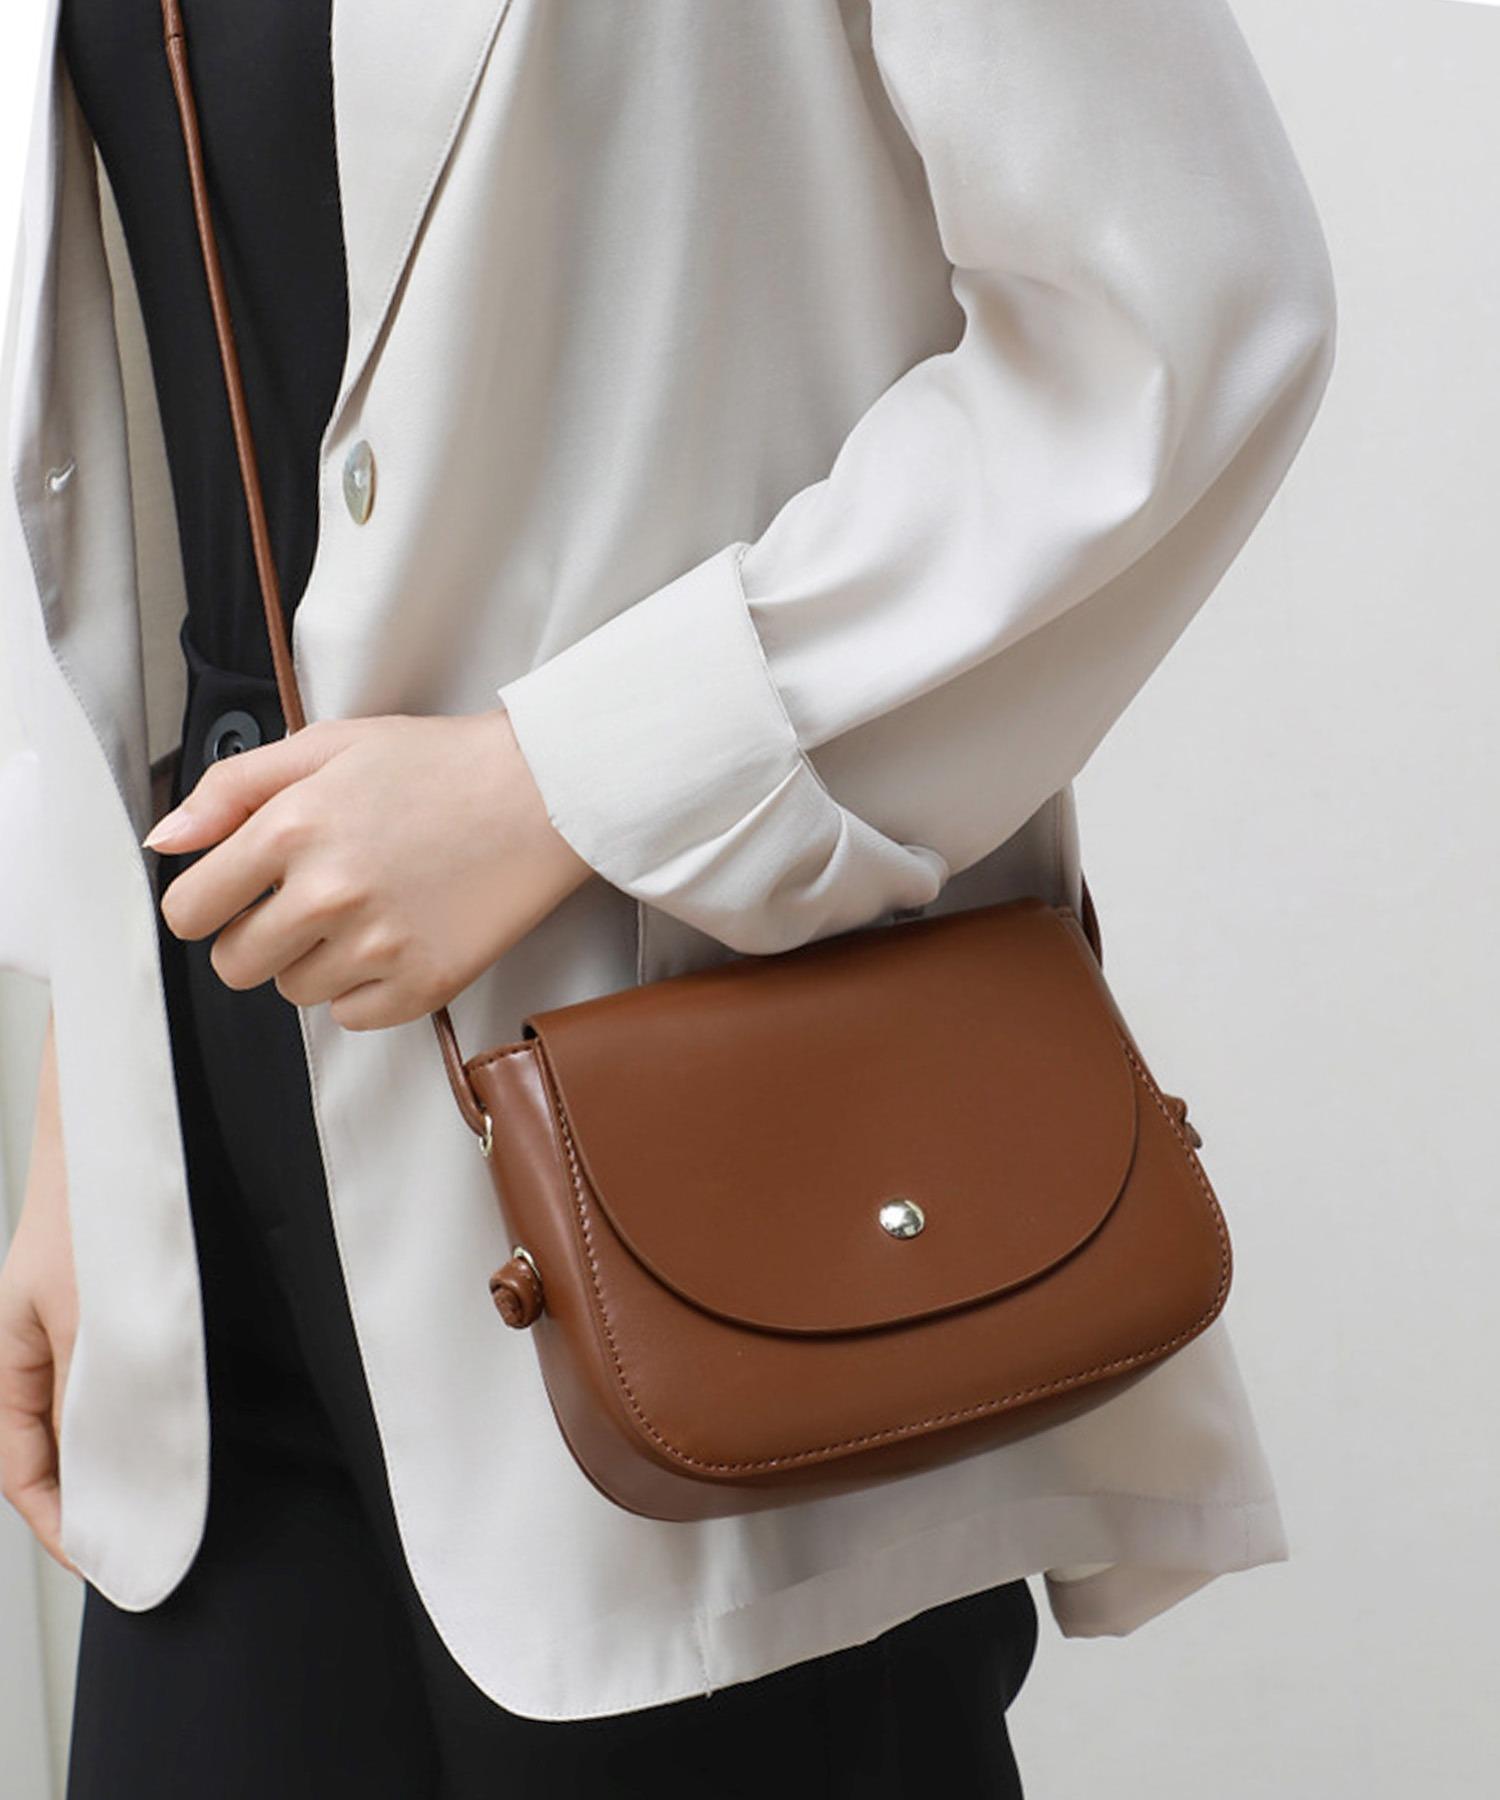 shopnikonikoのレディースバッグ